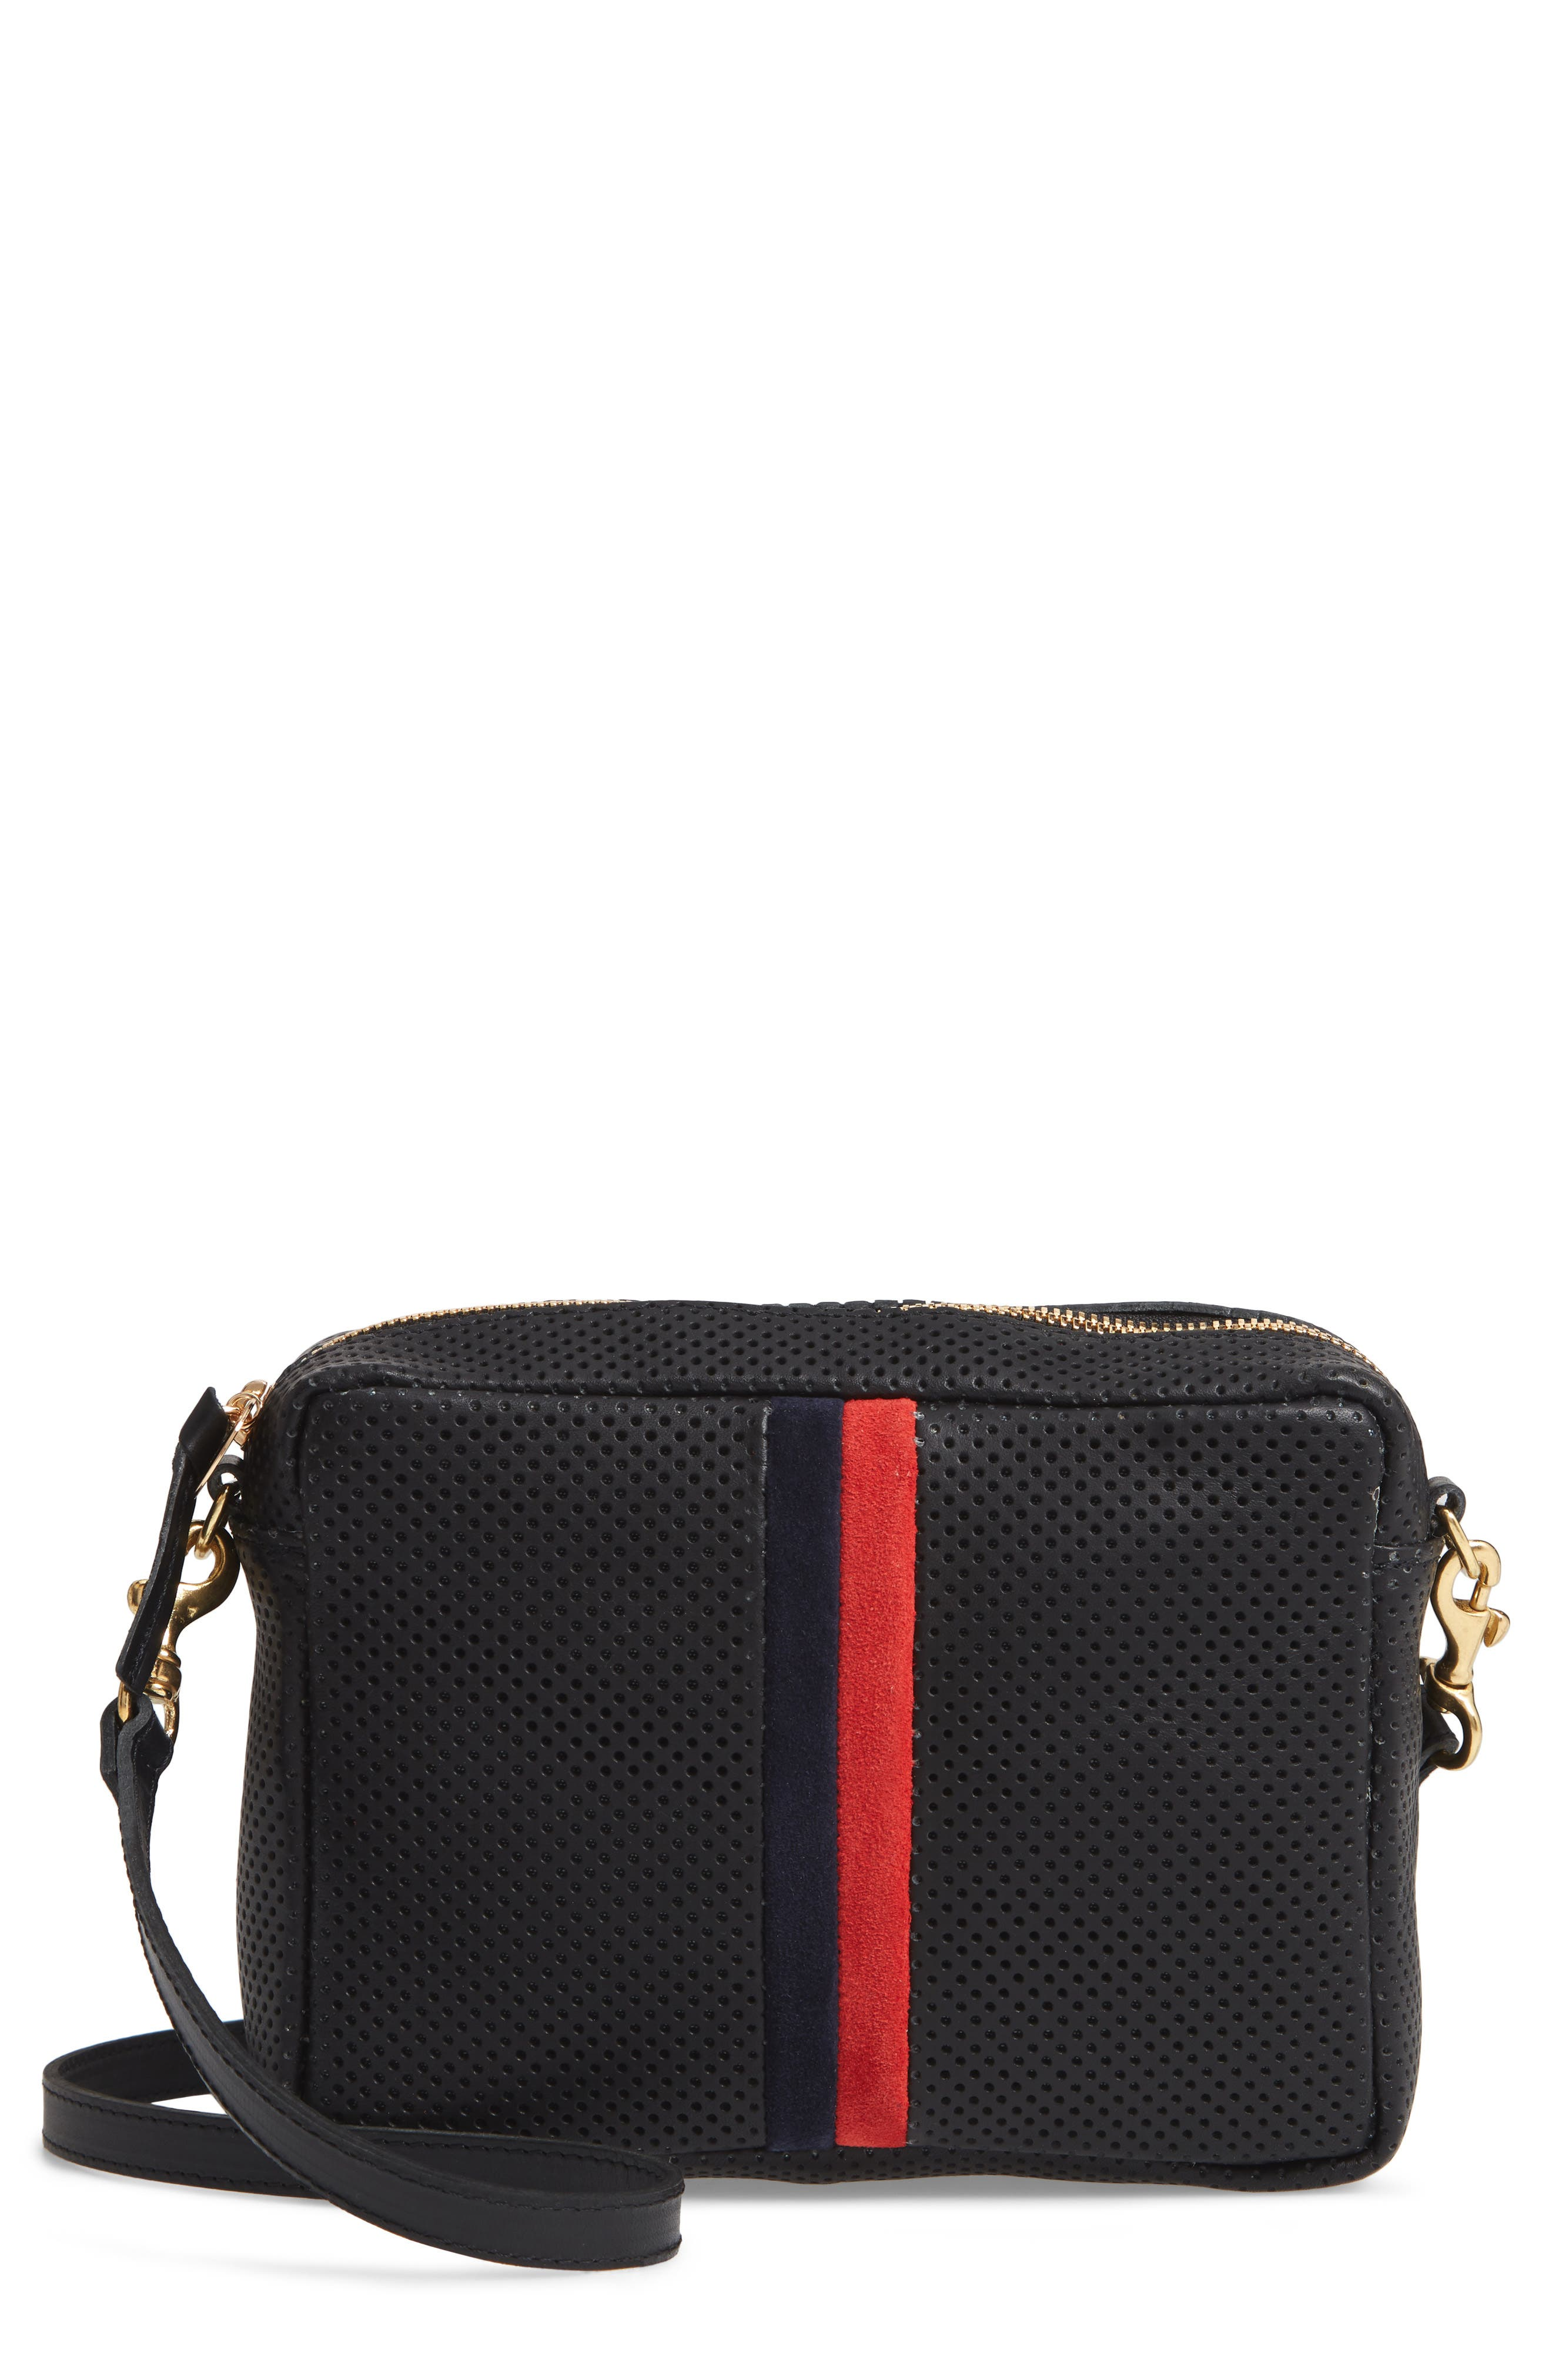 Midi Sac Perforated Leather Crossbody Bag